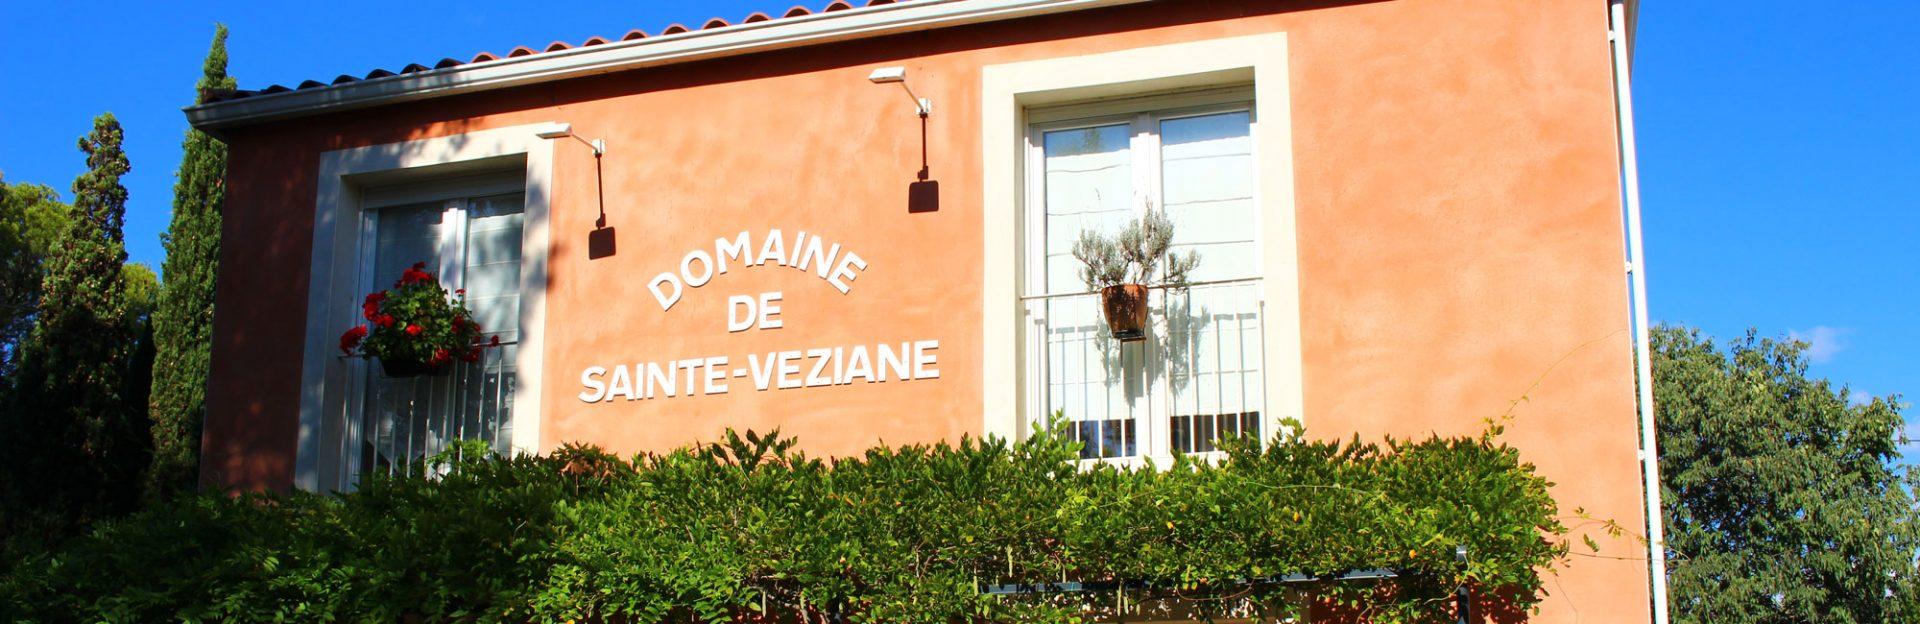 Domaine De Sainte Veziane : Img 2067